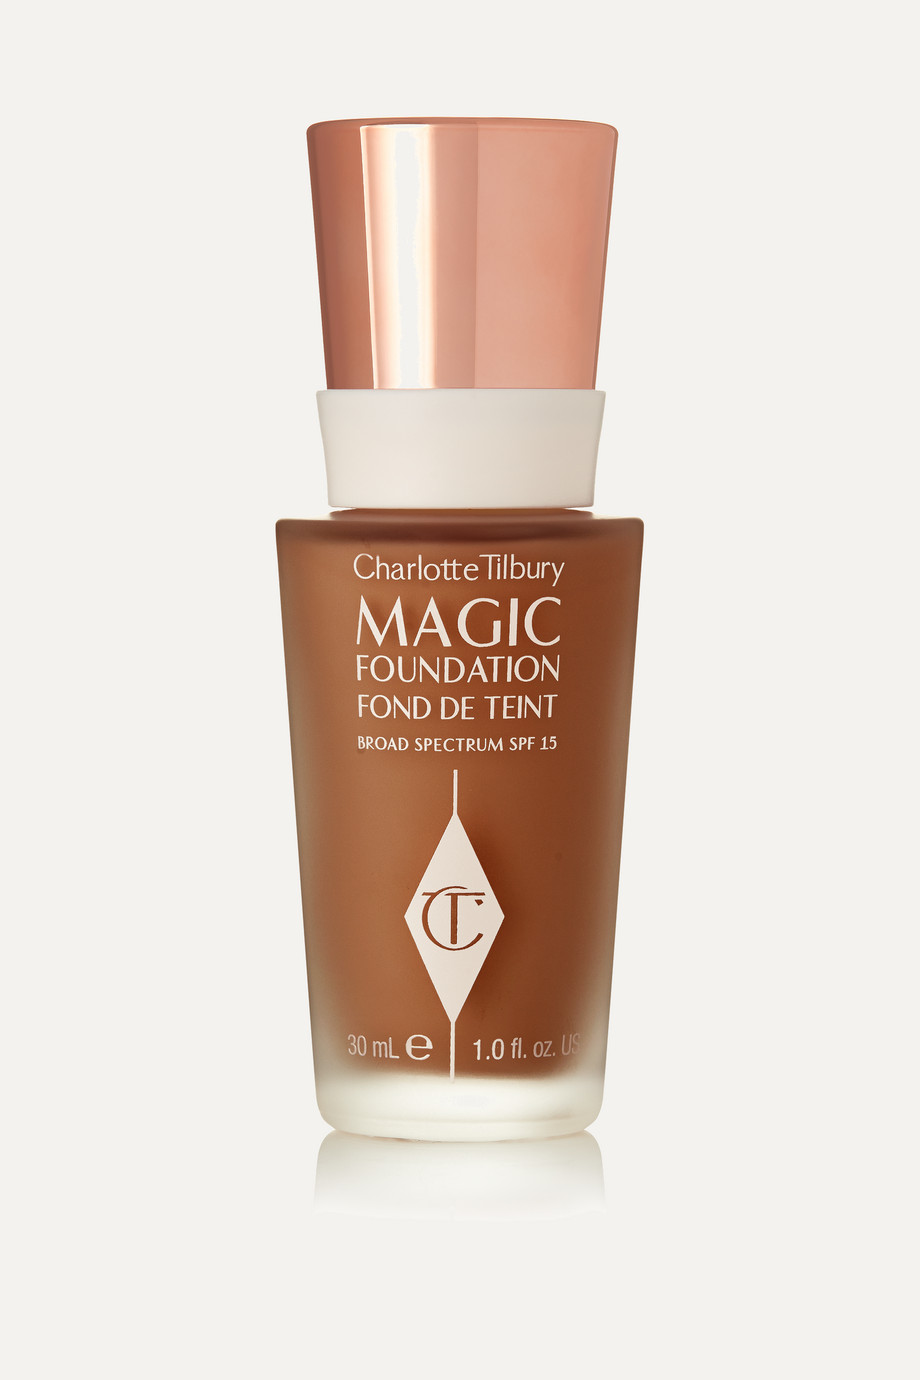 Charlotte Tilbury Magic Foundation Flawless Long-Lasting Coverage SPF15 - Shade 10, 30ml